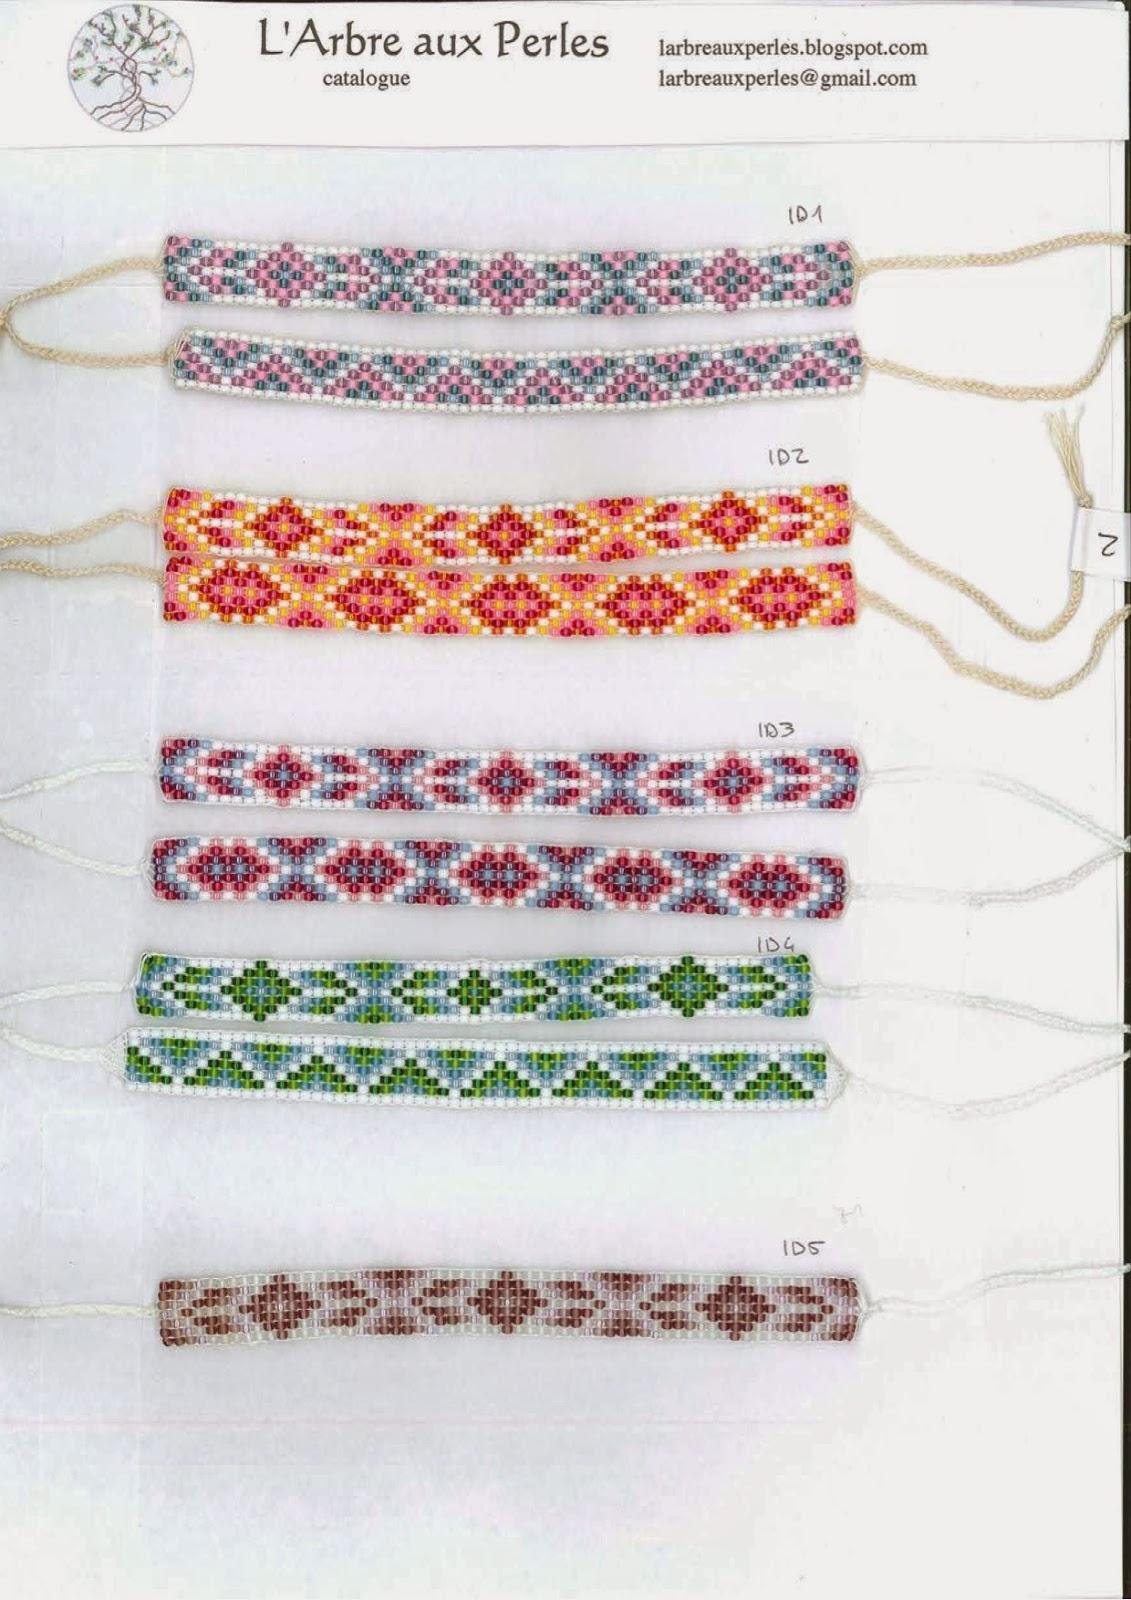 l 39 arbre aux perles bracelets toho catalogue 2 4 collection indiana dream. Black Bedroom Furniture Sets. Home Design Ideas